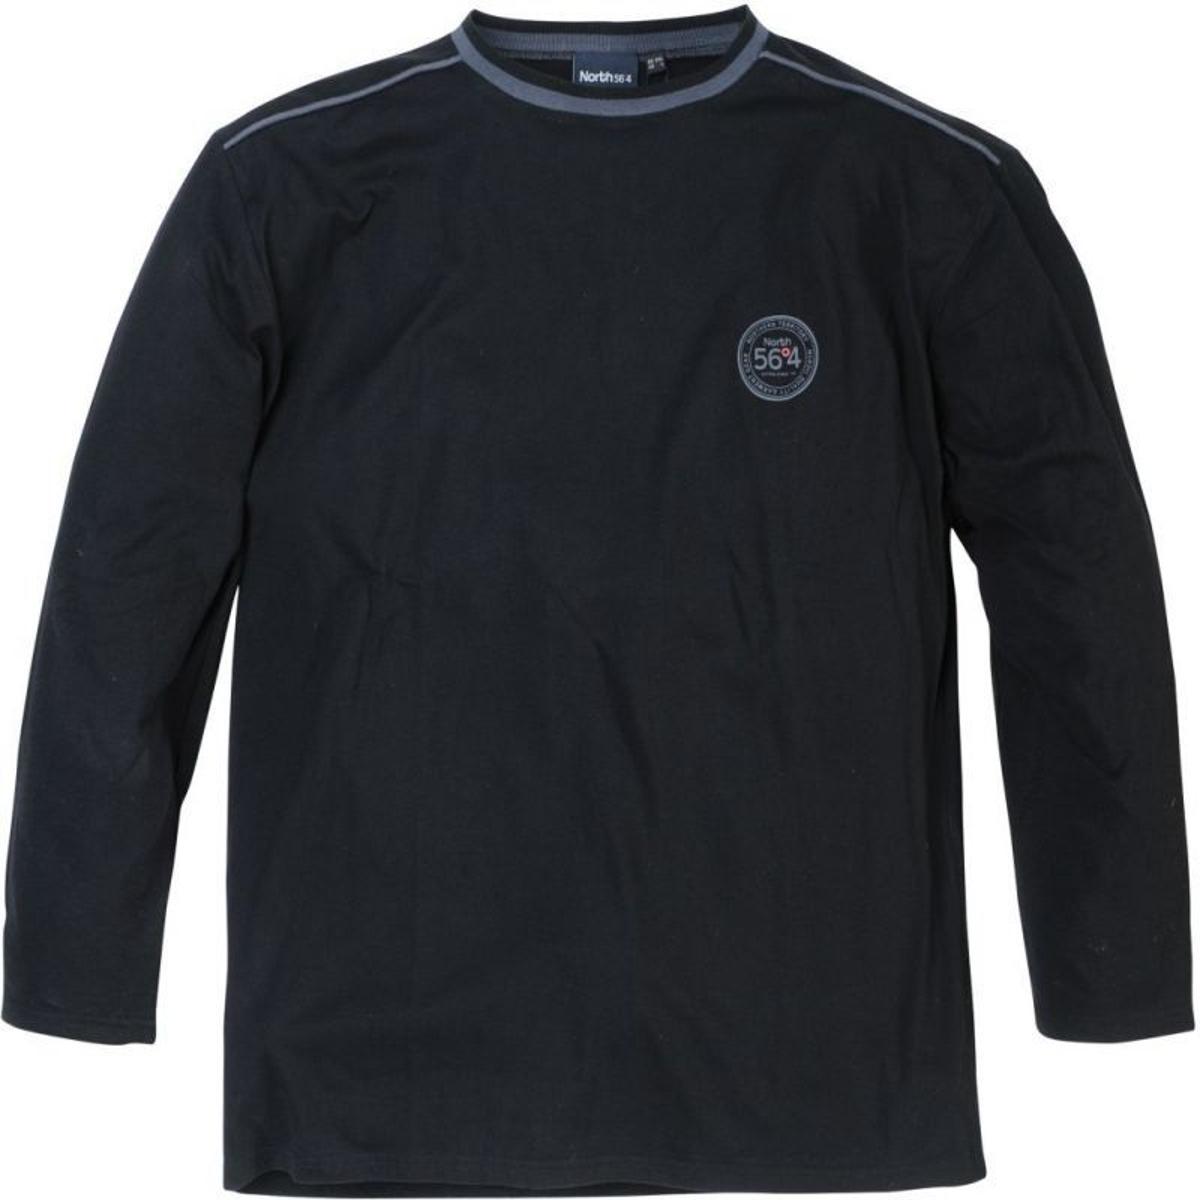 T-shirt col rond manches longues north noir